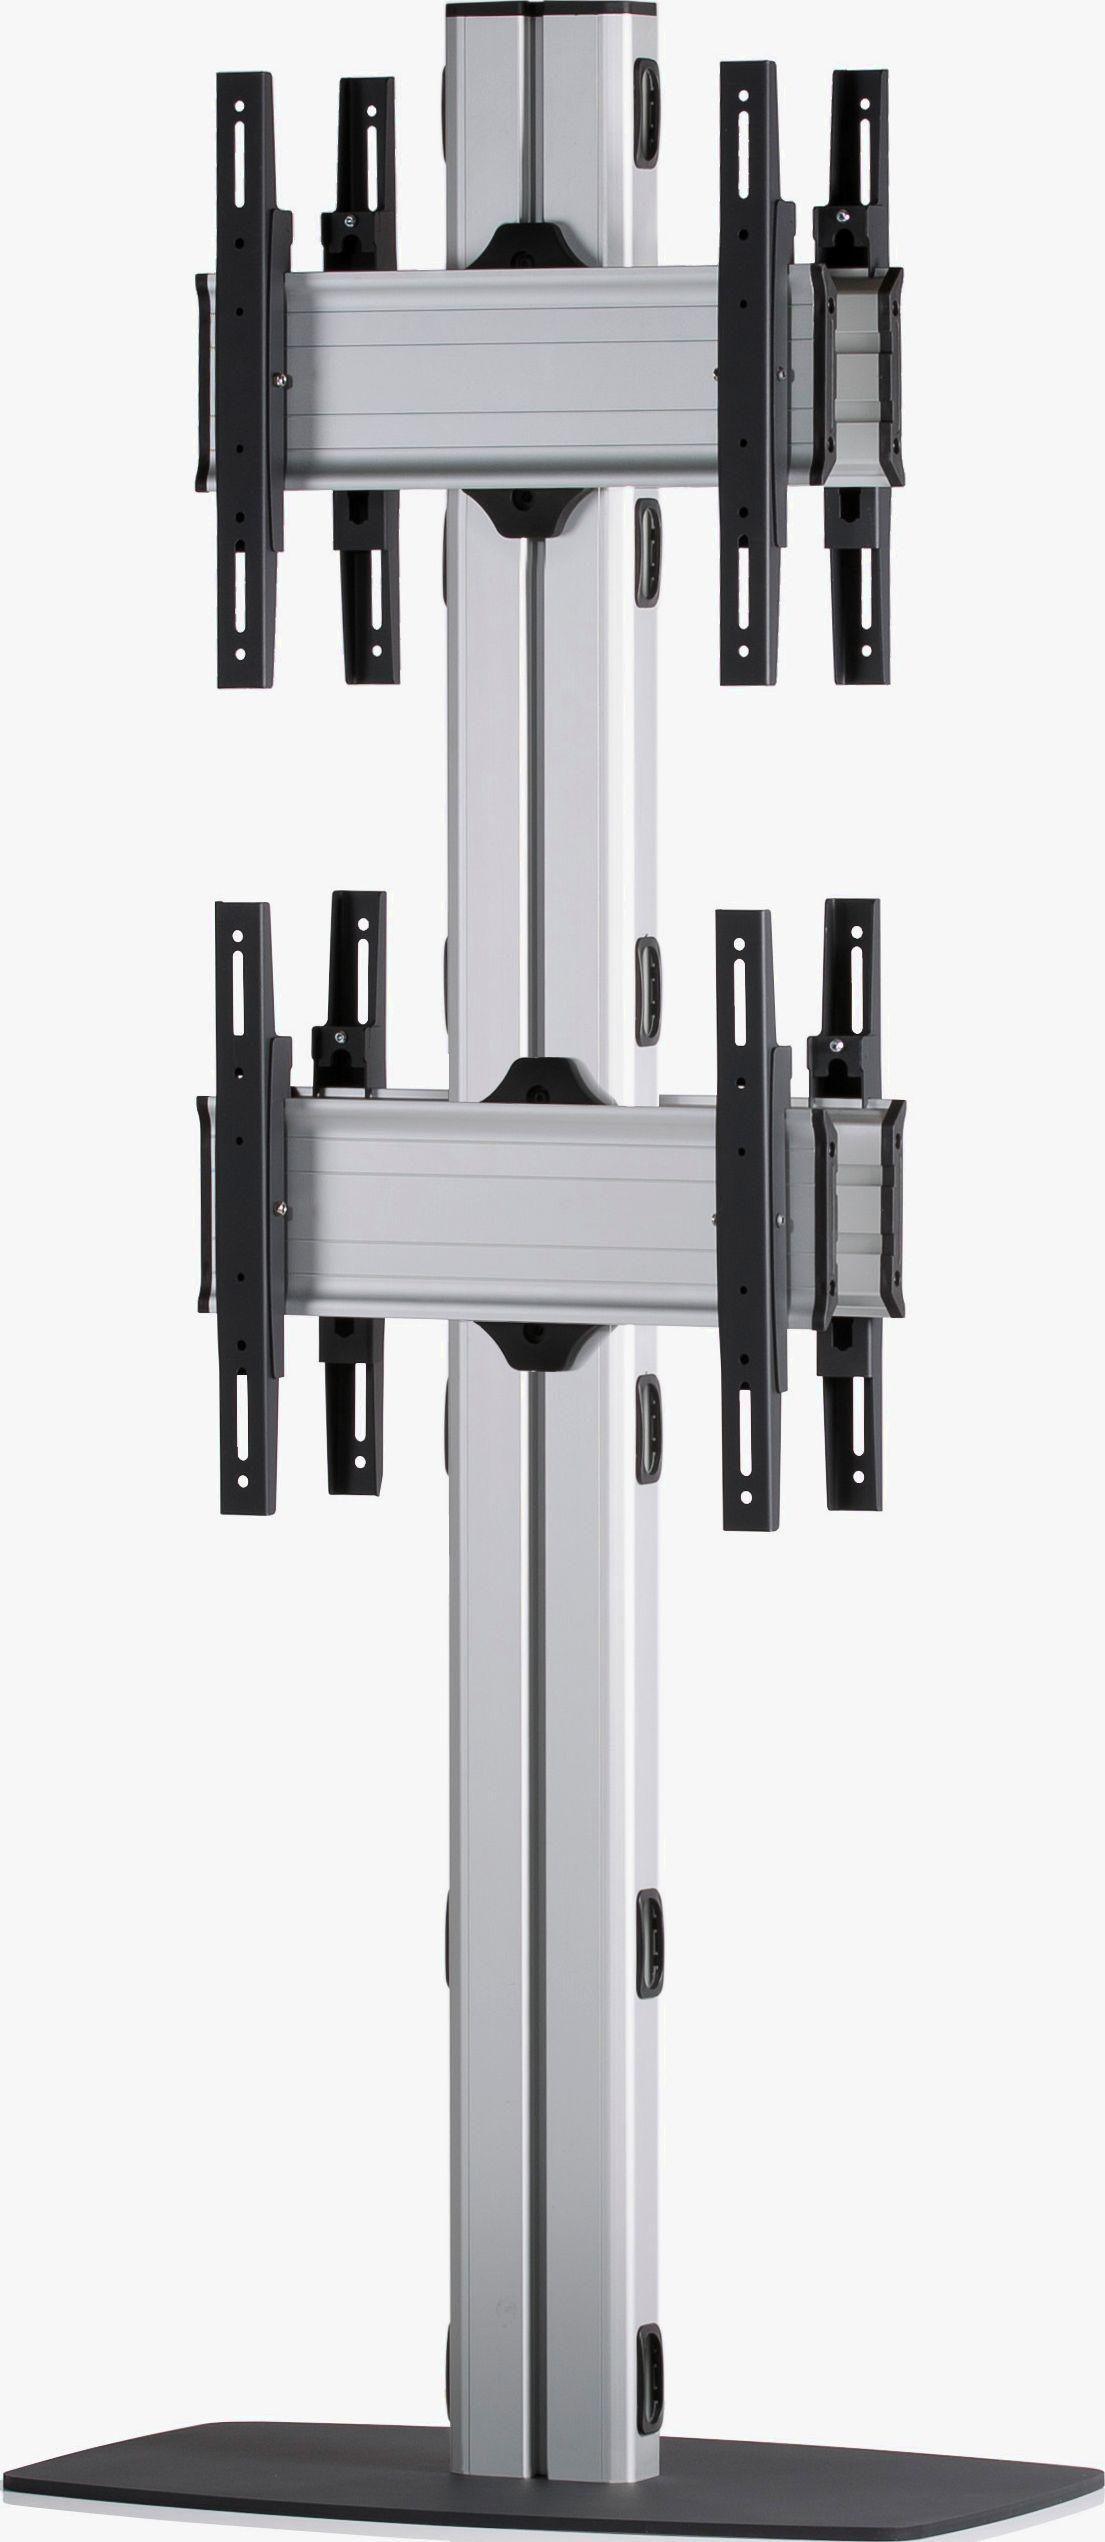 4 Displays 2x1 beidseitig, Standard-VESA, mit Standfuß